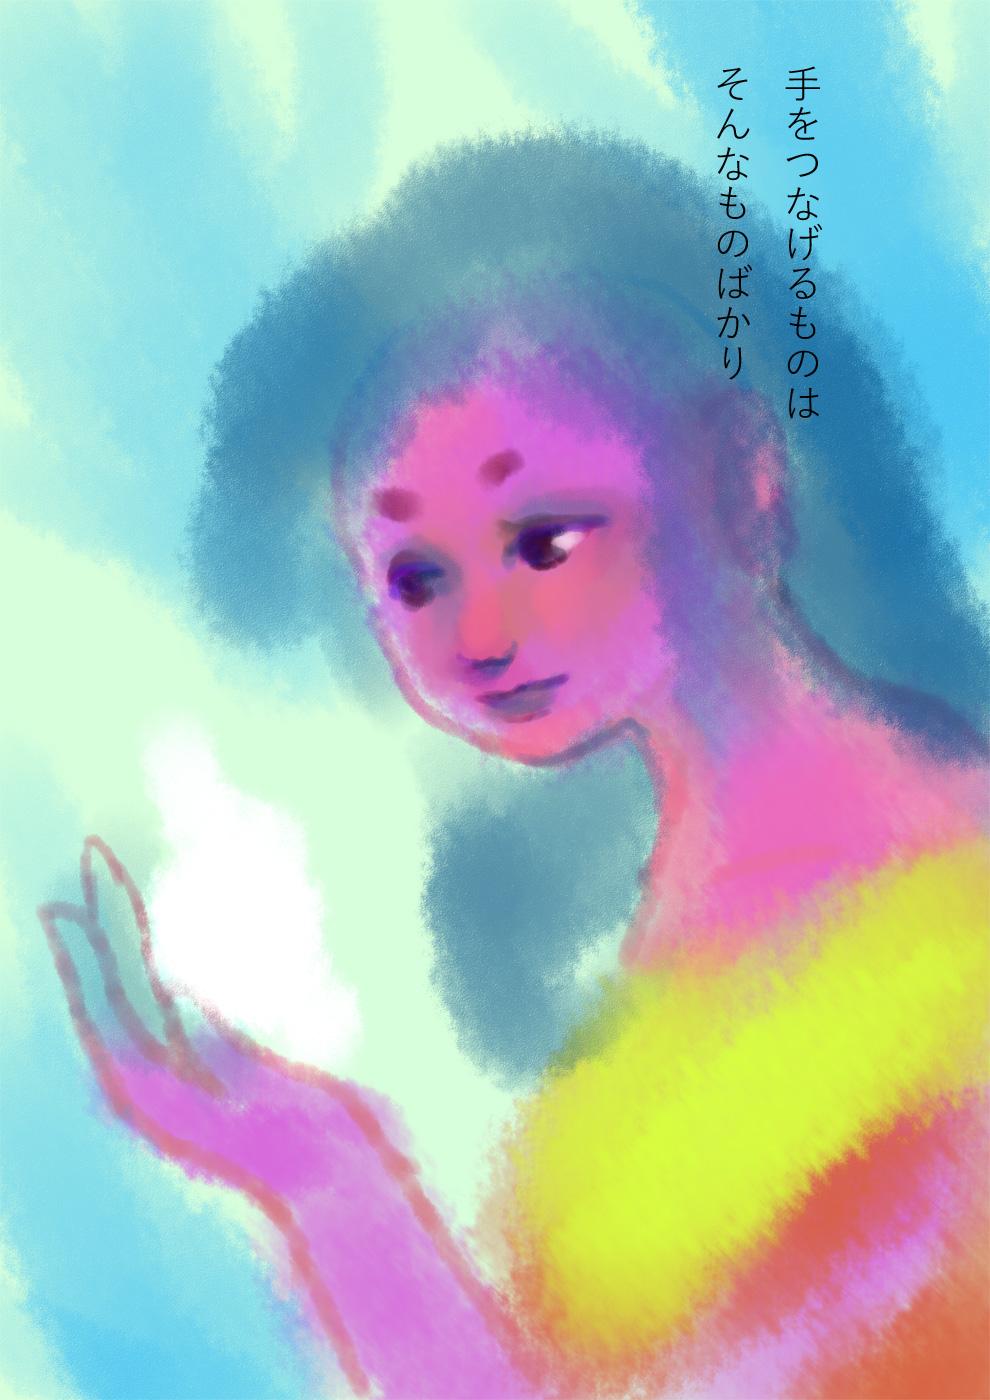 http://ahito.com/comic/ehon/voice/img/2018/20180323_2/02.jpg